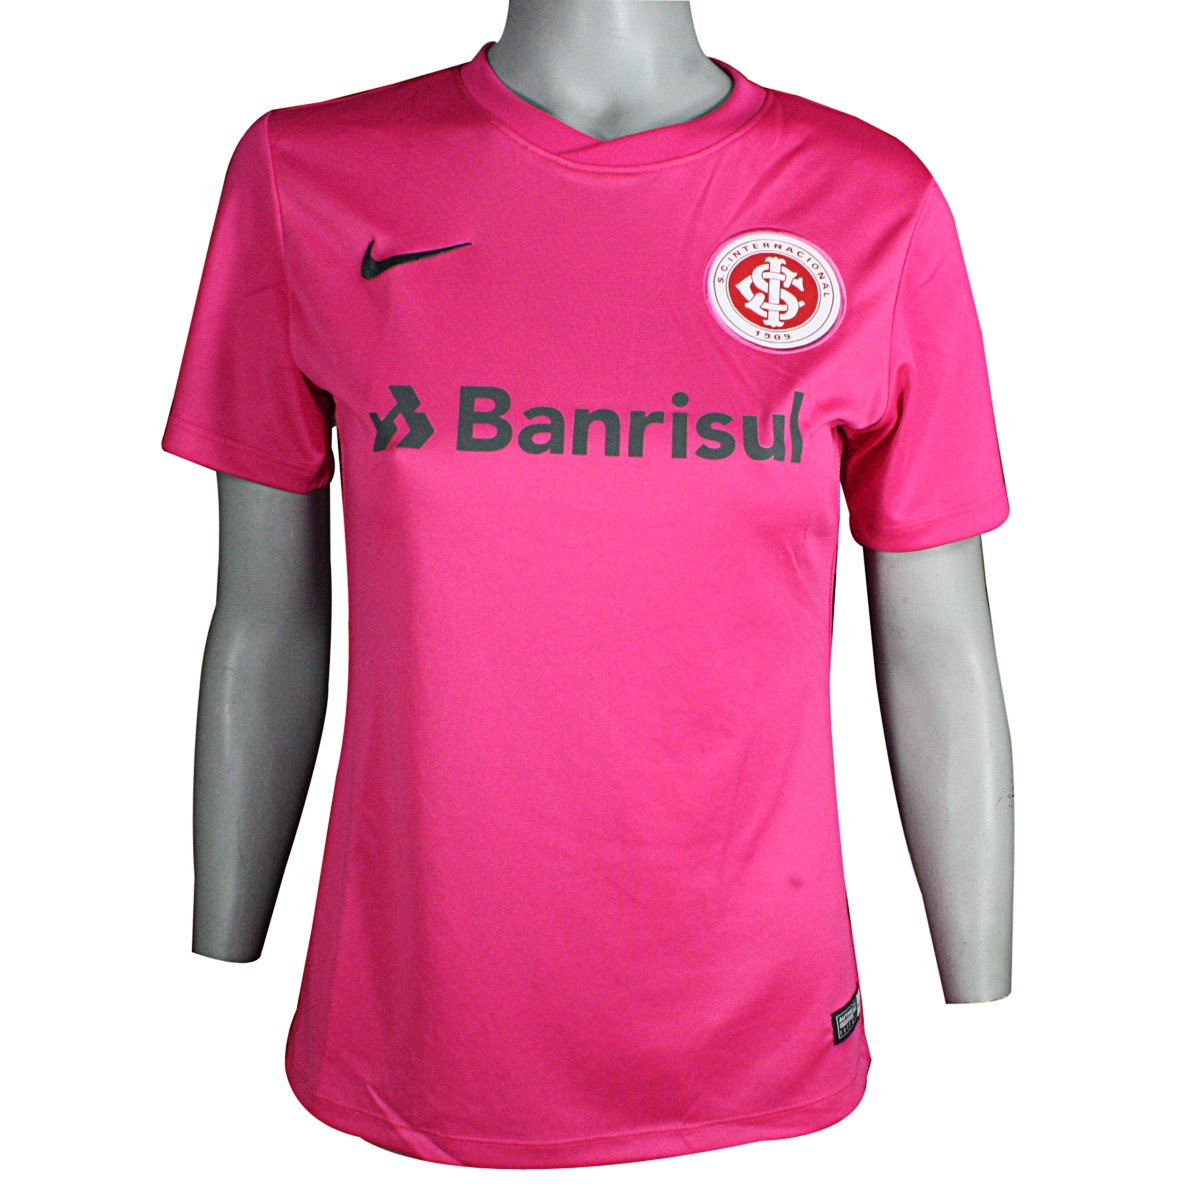 0fc8e47e532be Imagem - Camiseta Feminina Nike Inter Outubro Rosa